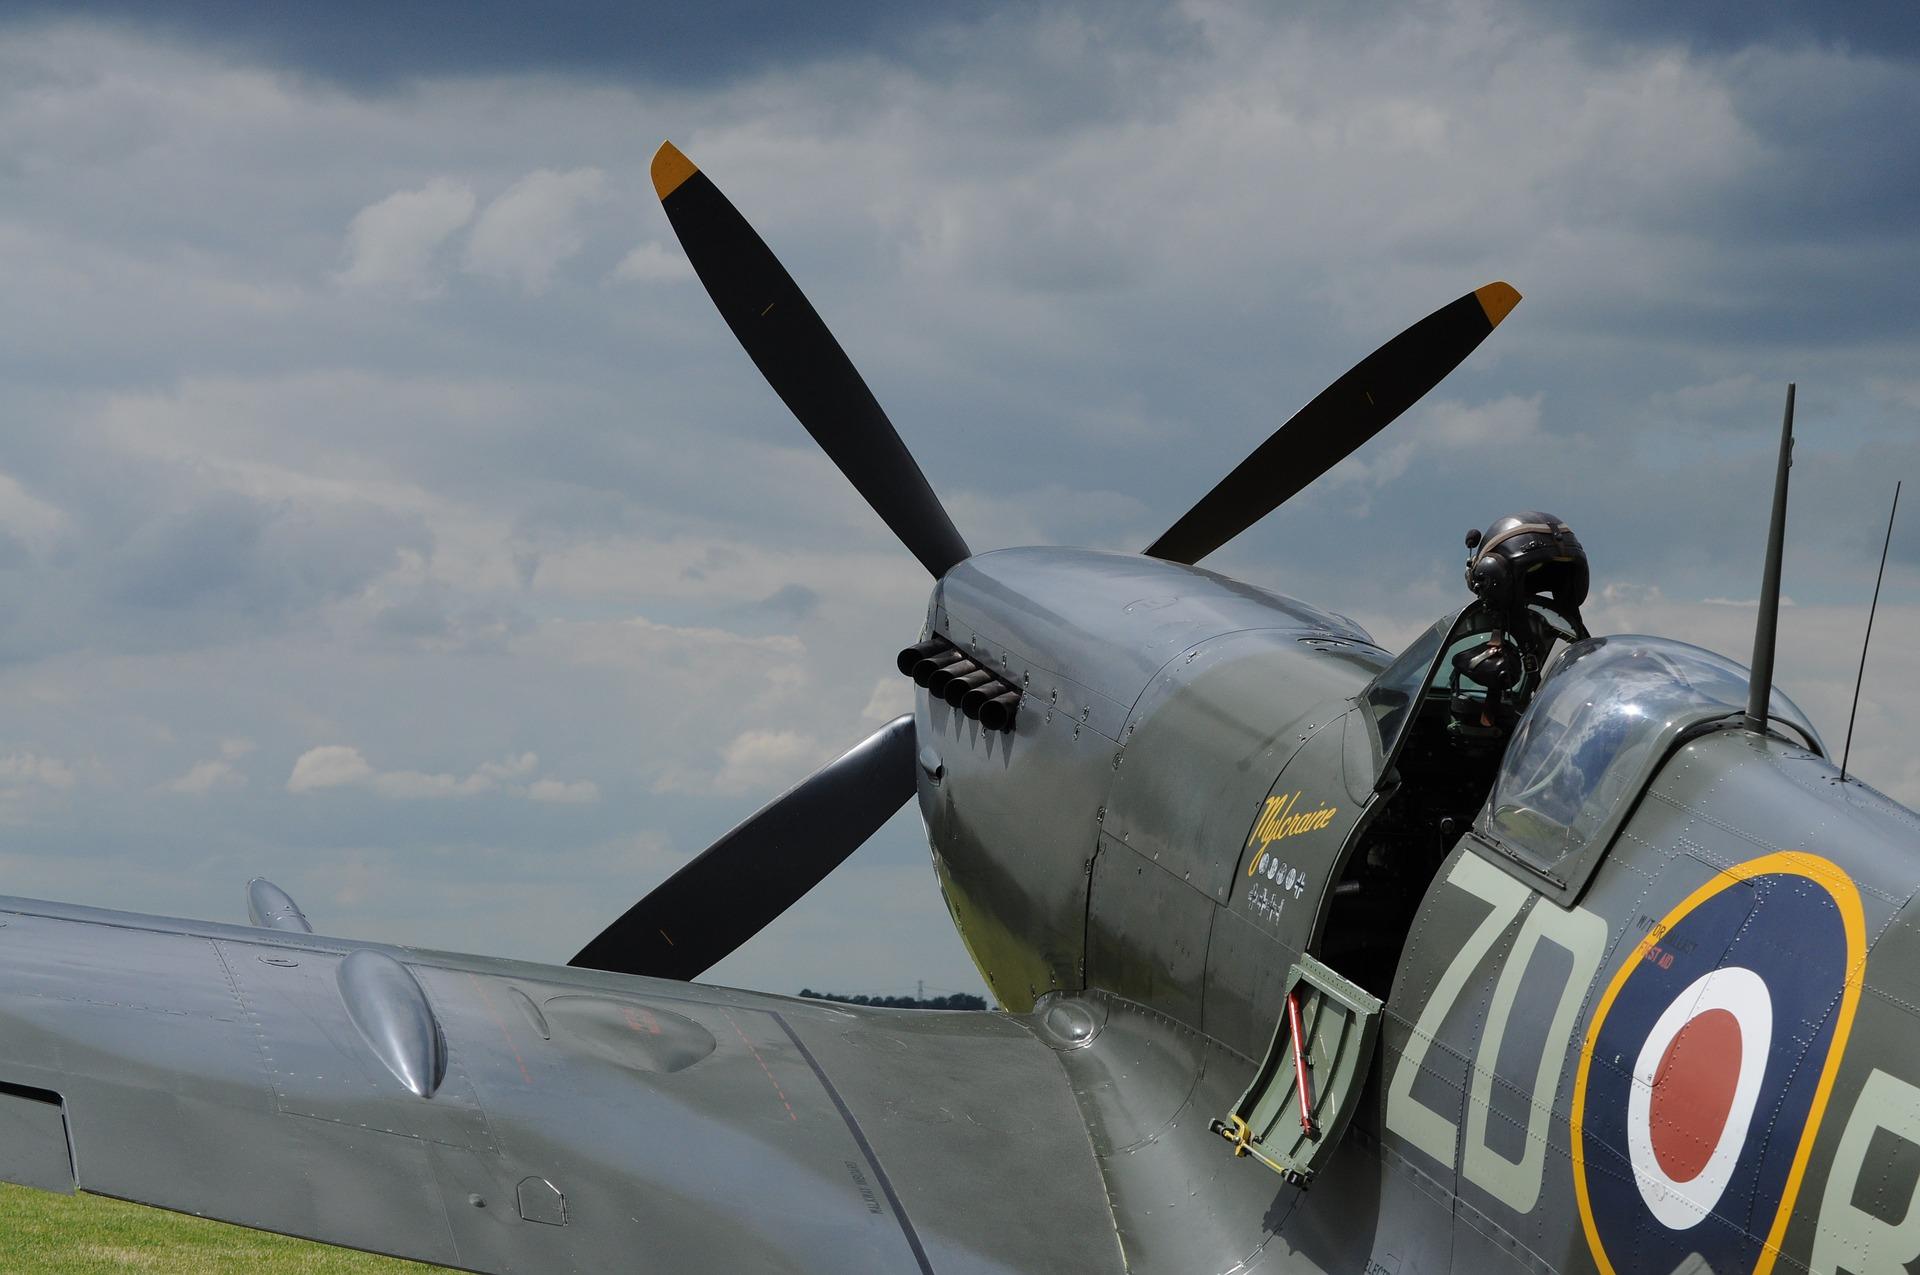 Historic plane restoration